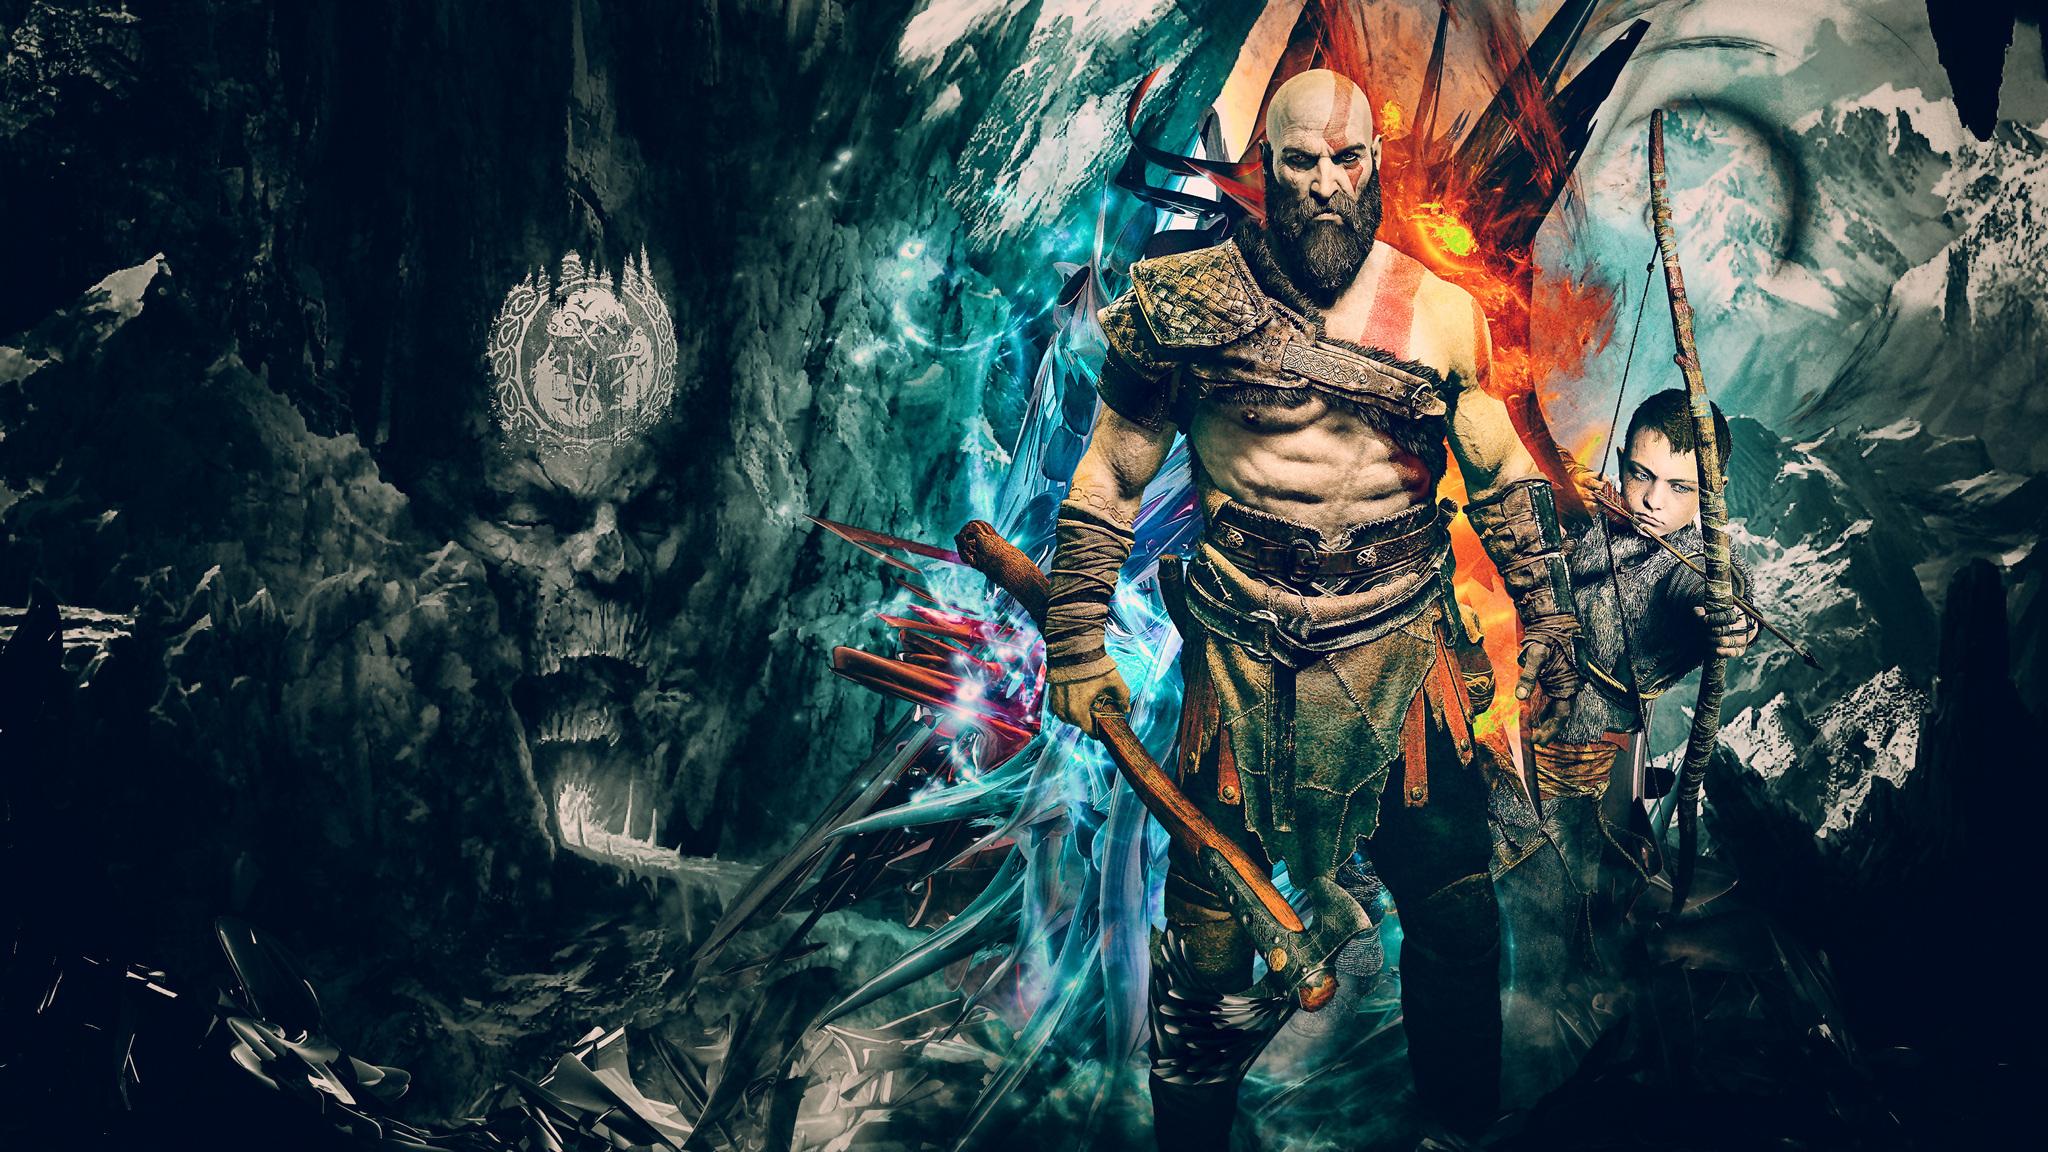 kratos-god-of-war-4k-artwork-w1.jpg